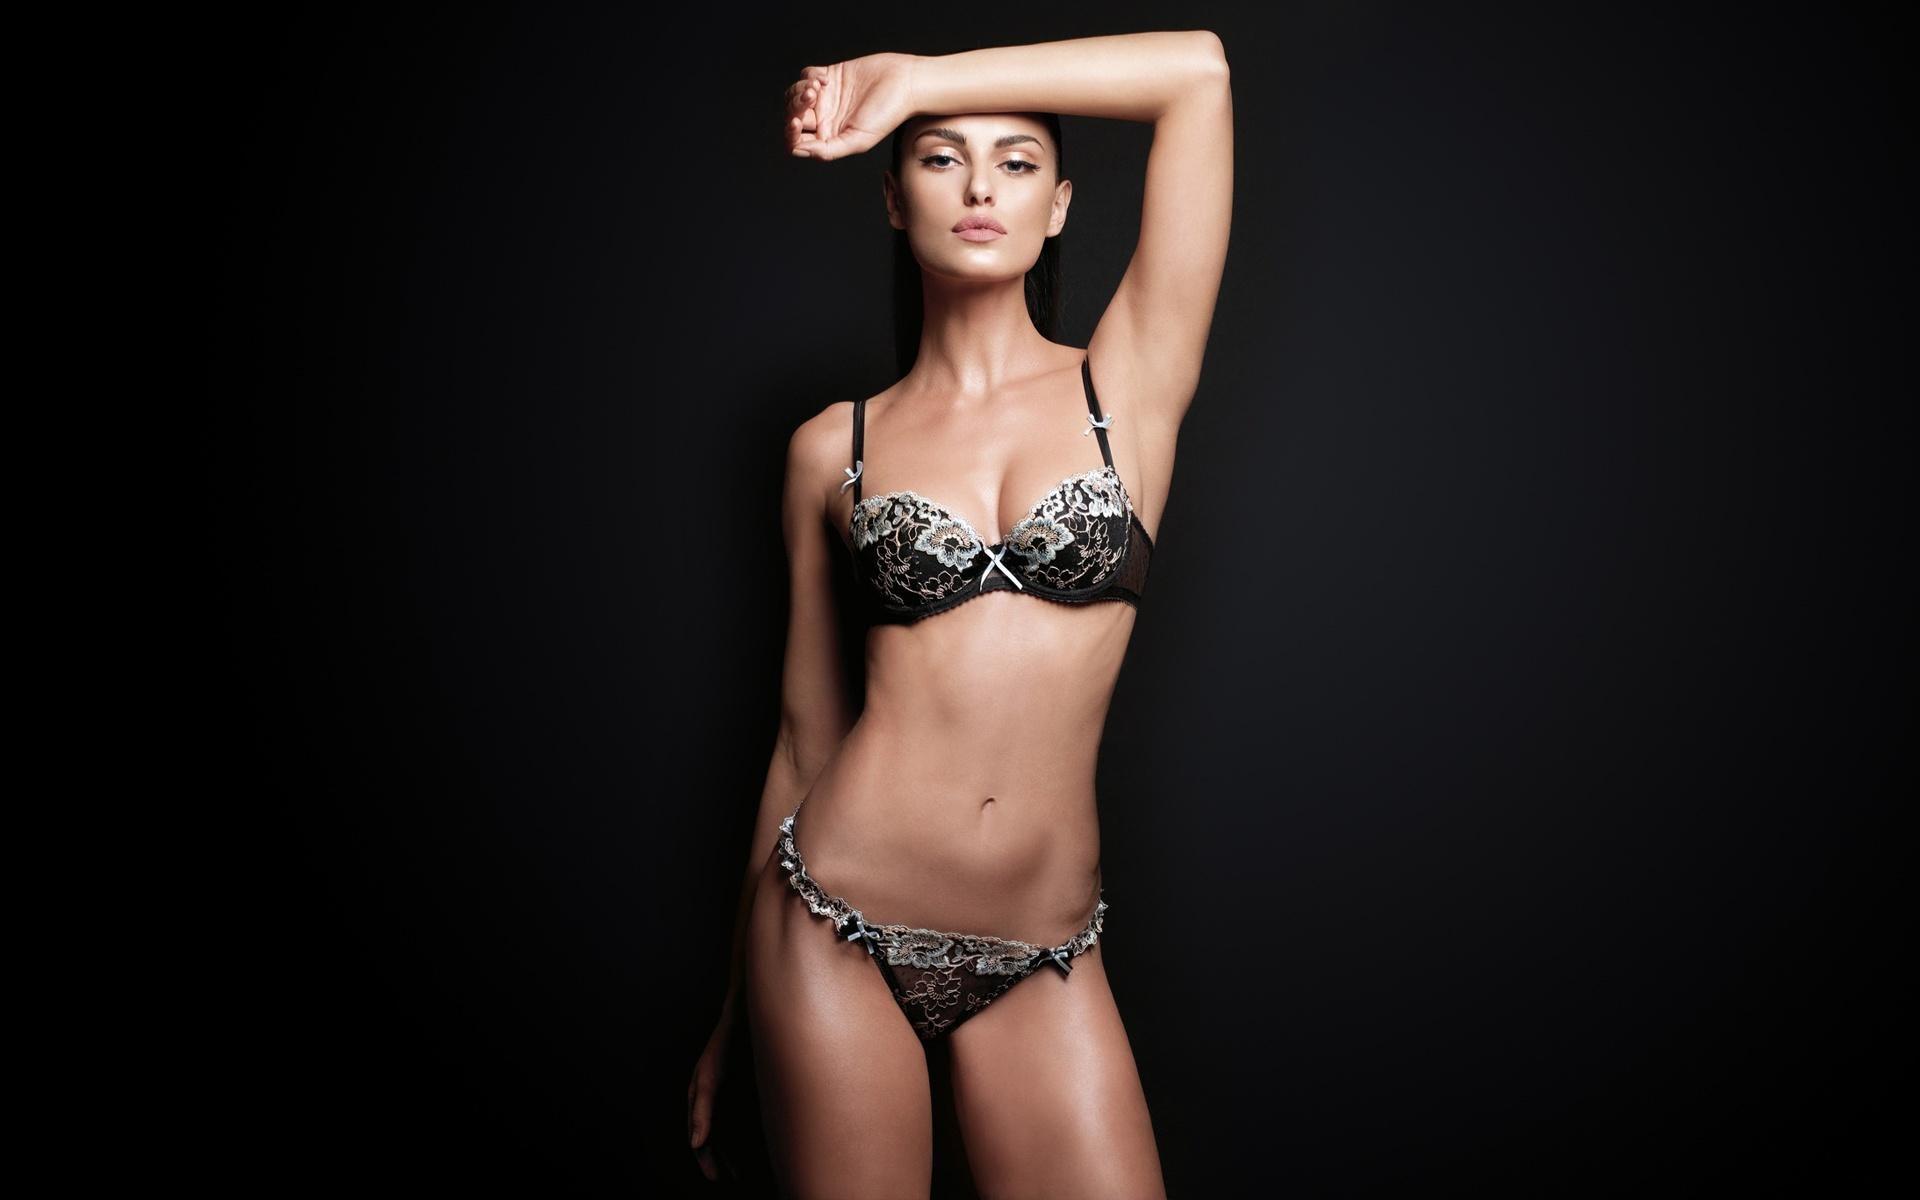 Hot Bikini Model Wallpaper 015   Hot Bikini Models Wallpapers 1920x1200